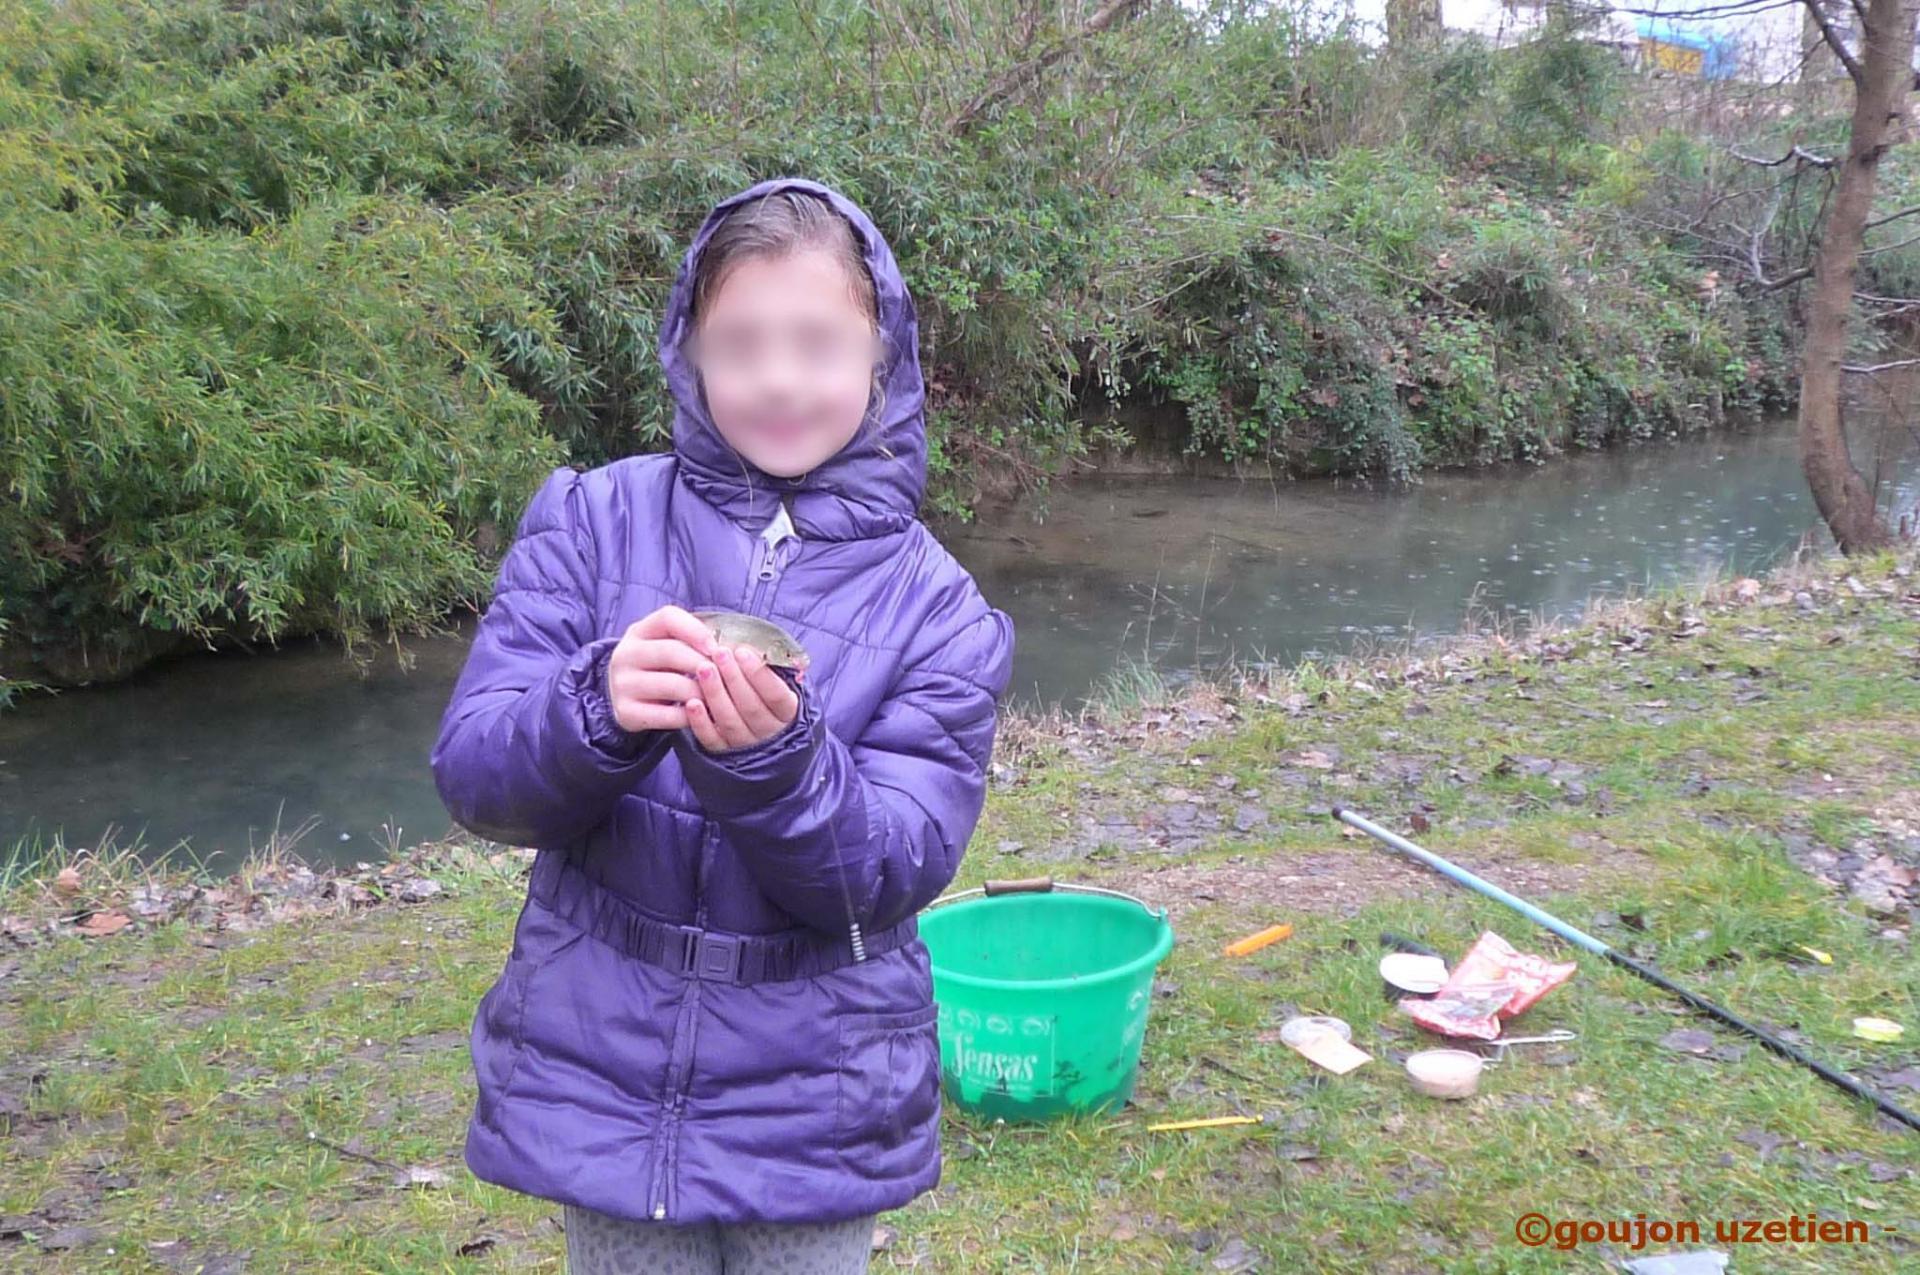 Atelier petit poisson fl goujon uzetien